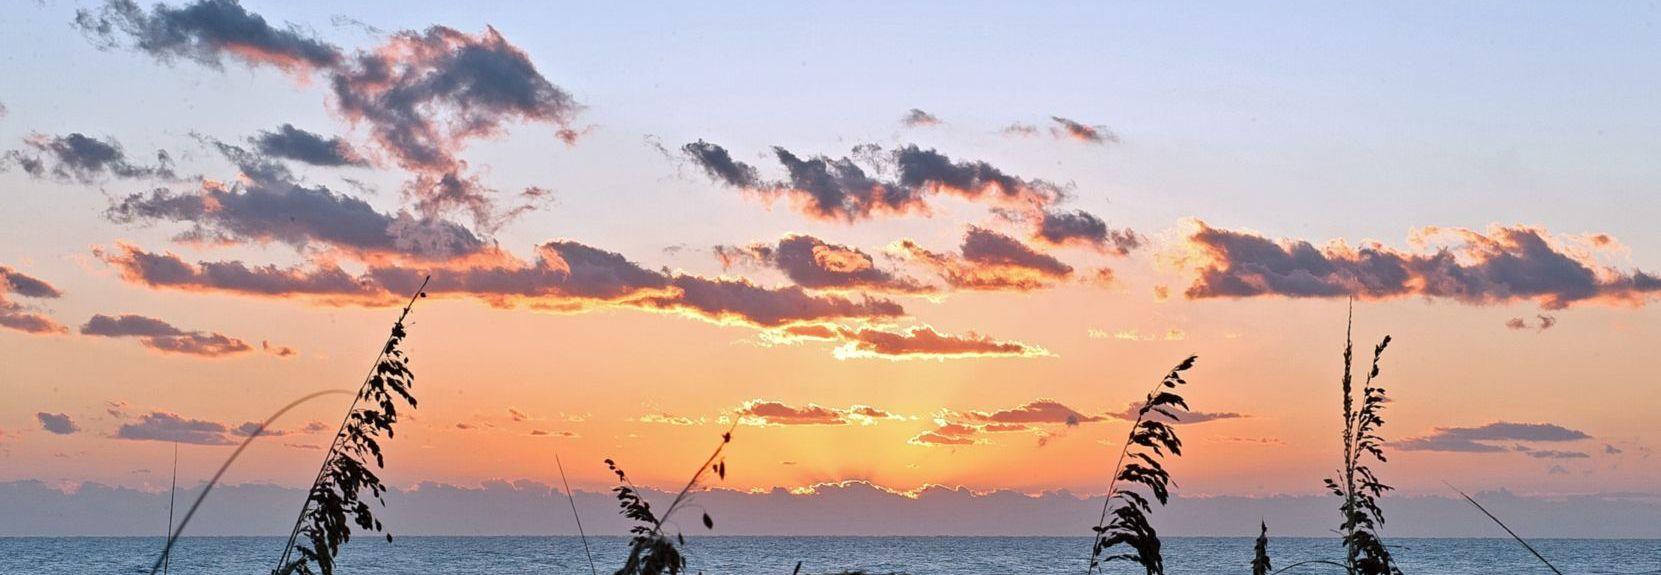 Oak Hill, Florida, United States of America